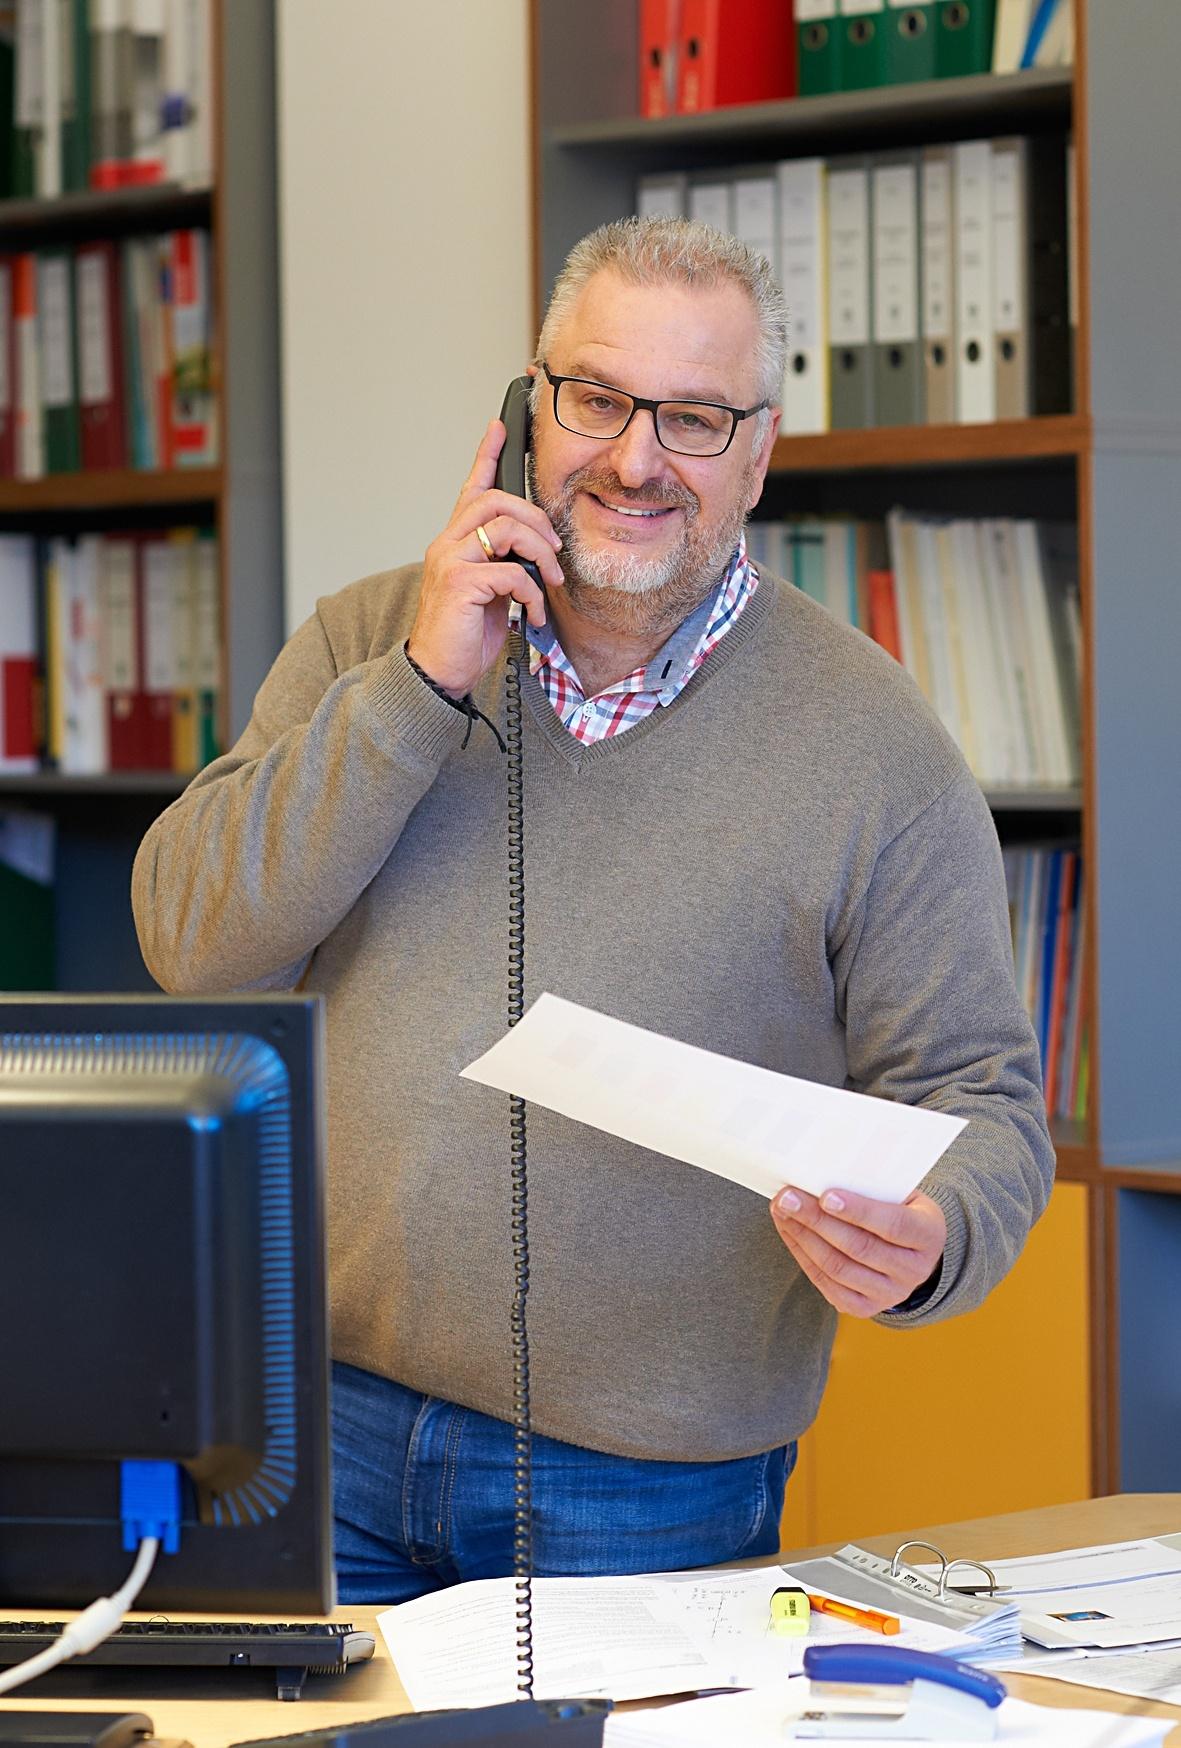 Bereichsleiter Herr Negele Energieeffizienz - eta Energieberatung